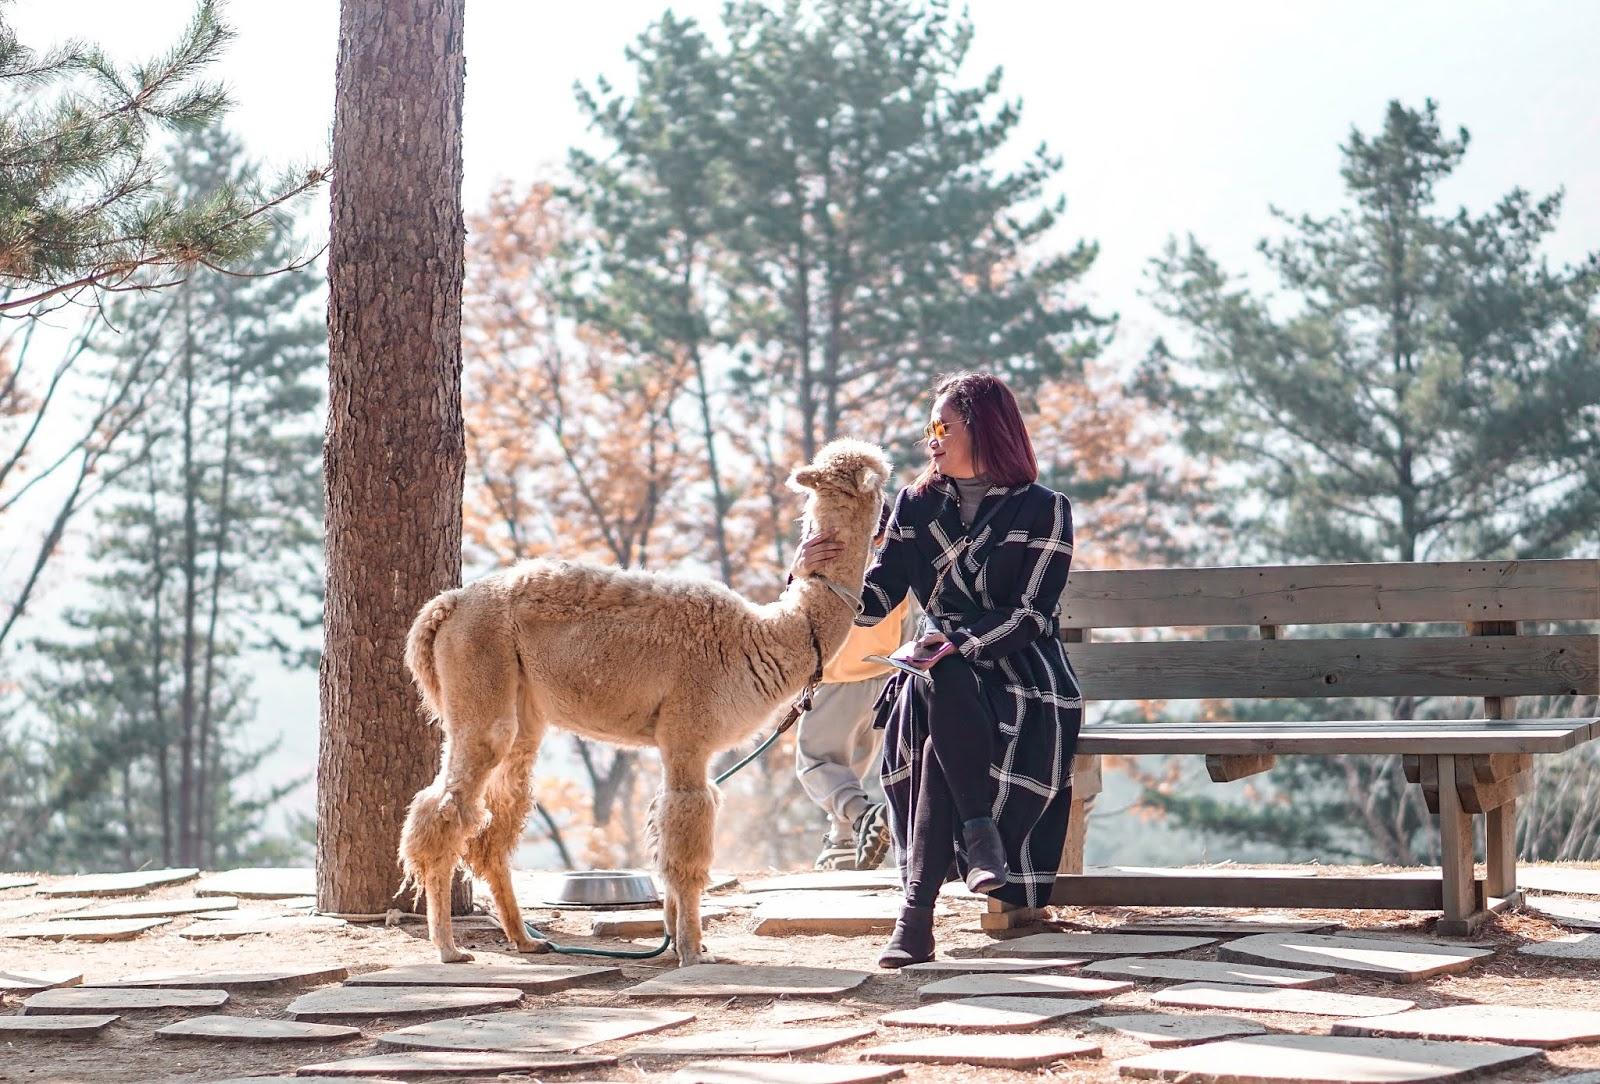 South Korea, AutumnInKorea, TrazyMemories, Alpaca World, Gangwon, what to do in South Korea, Seoul, Asia, abroad, thedailyposhtravels, the daily posh